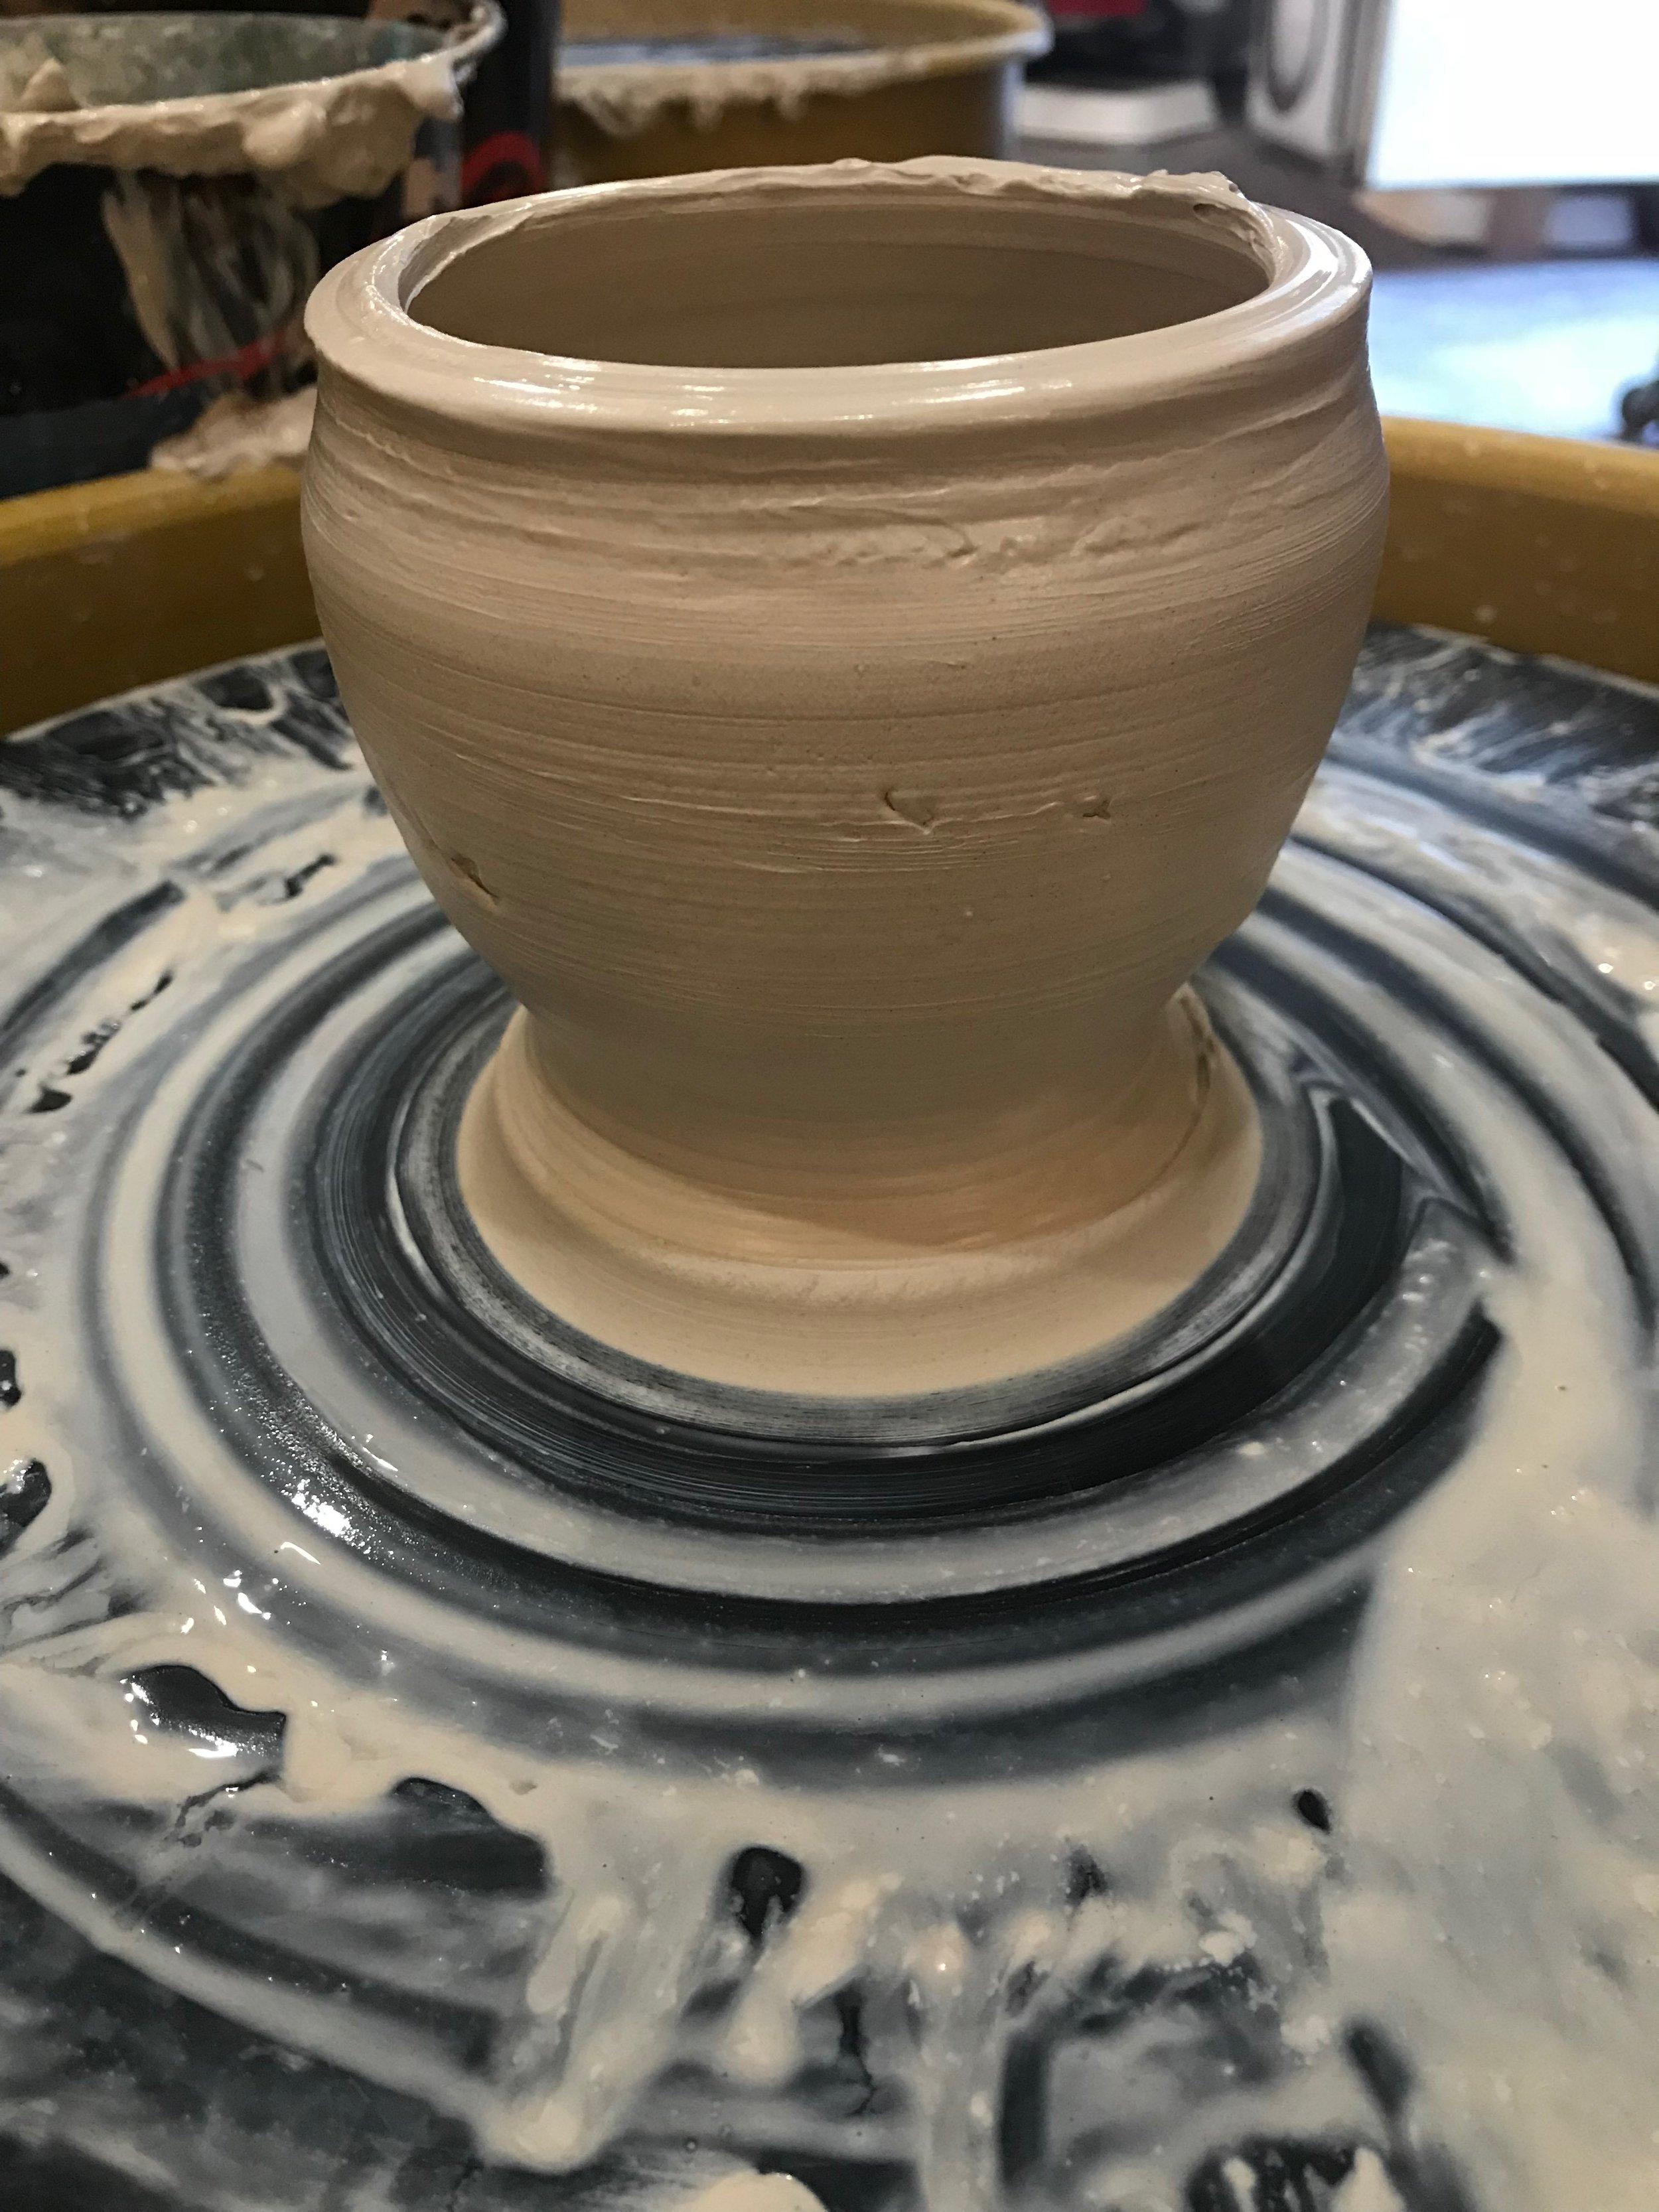 Day 340. Today I threw a Pot.